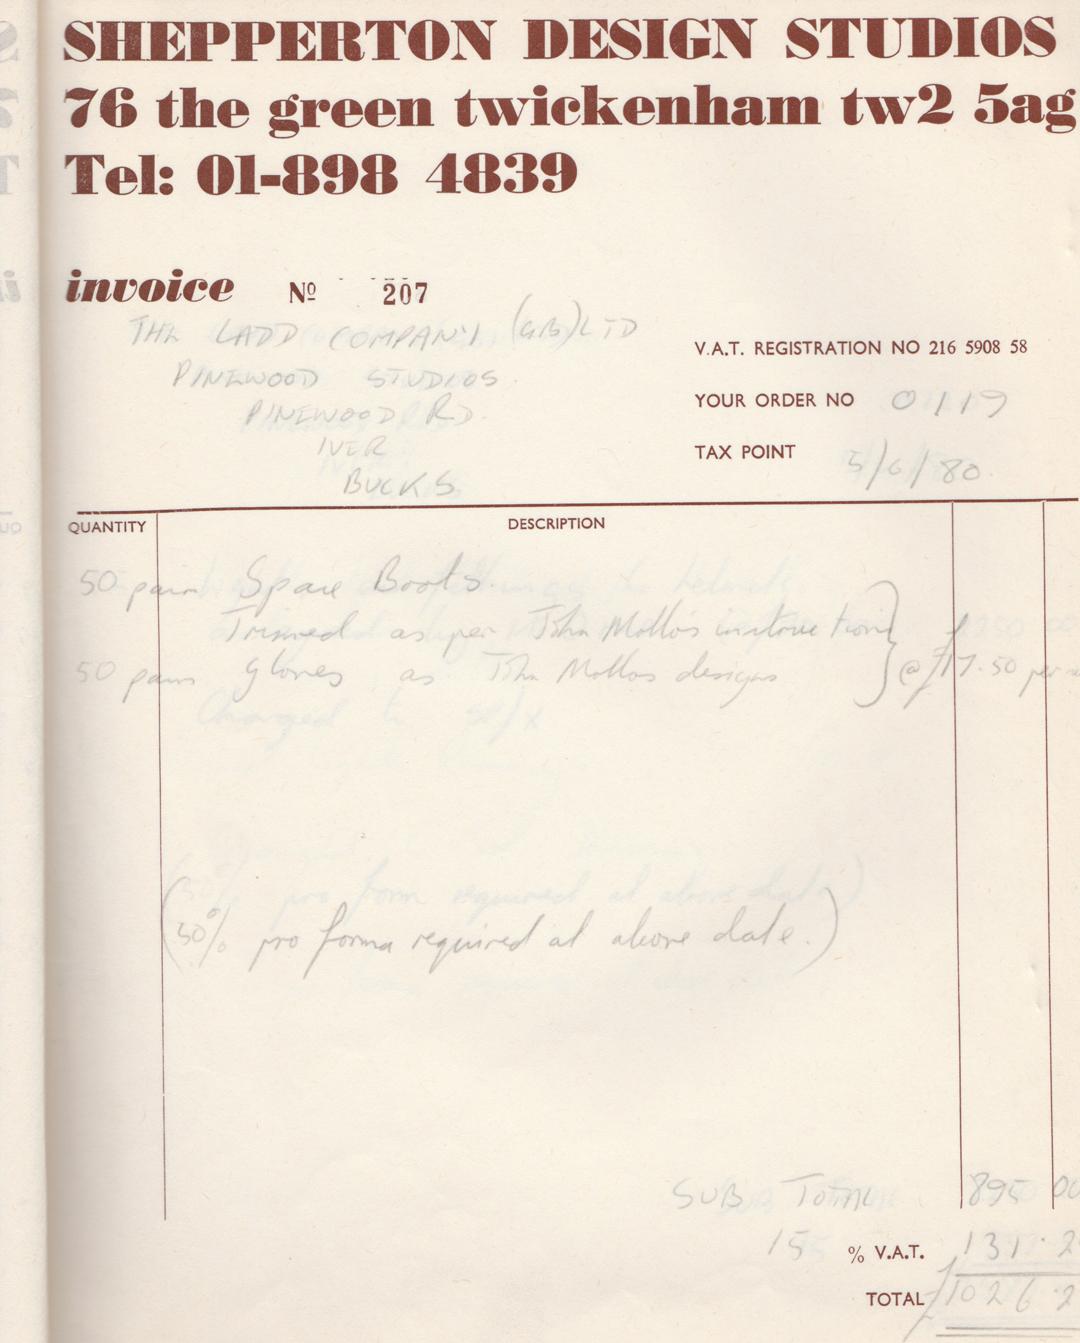 Outland-invoice-207.jpg